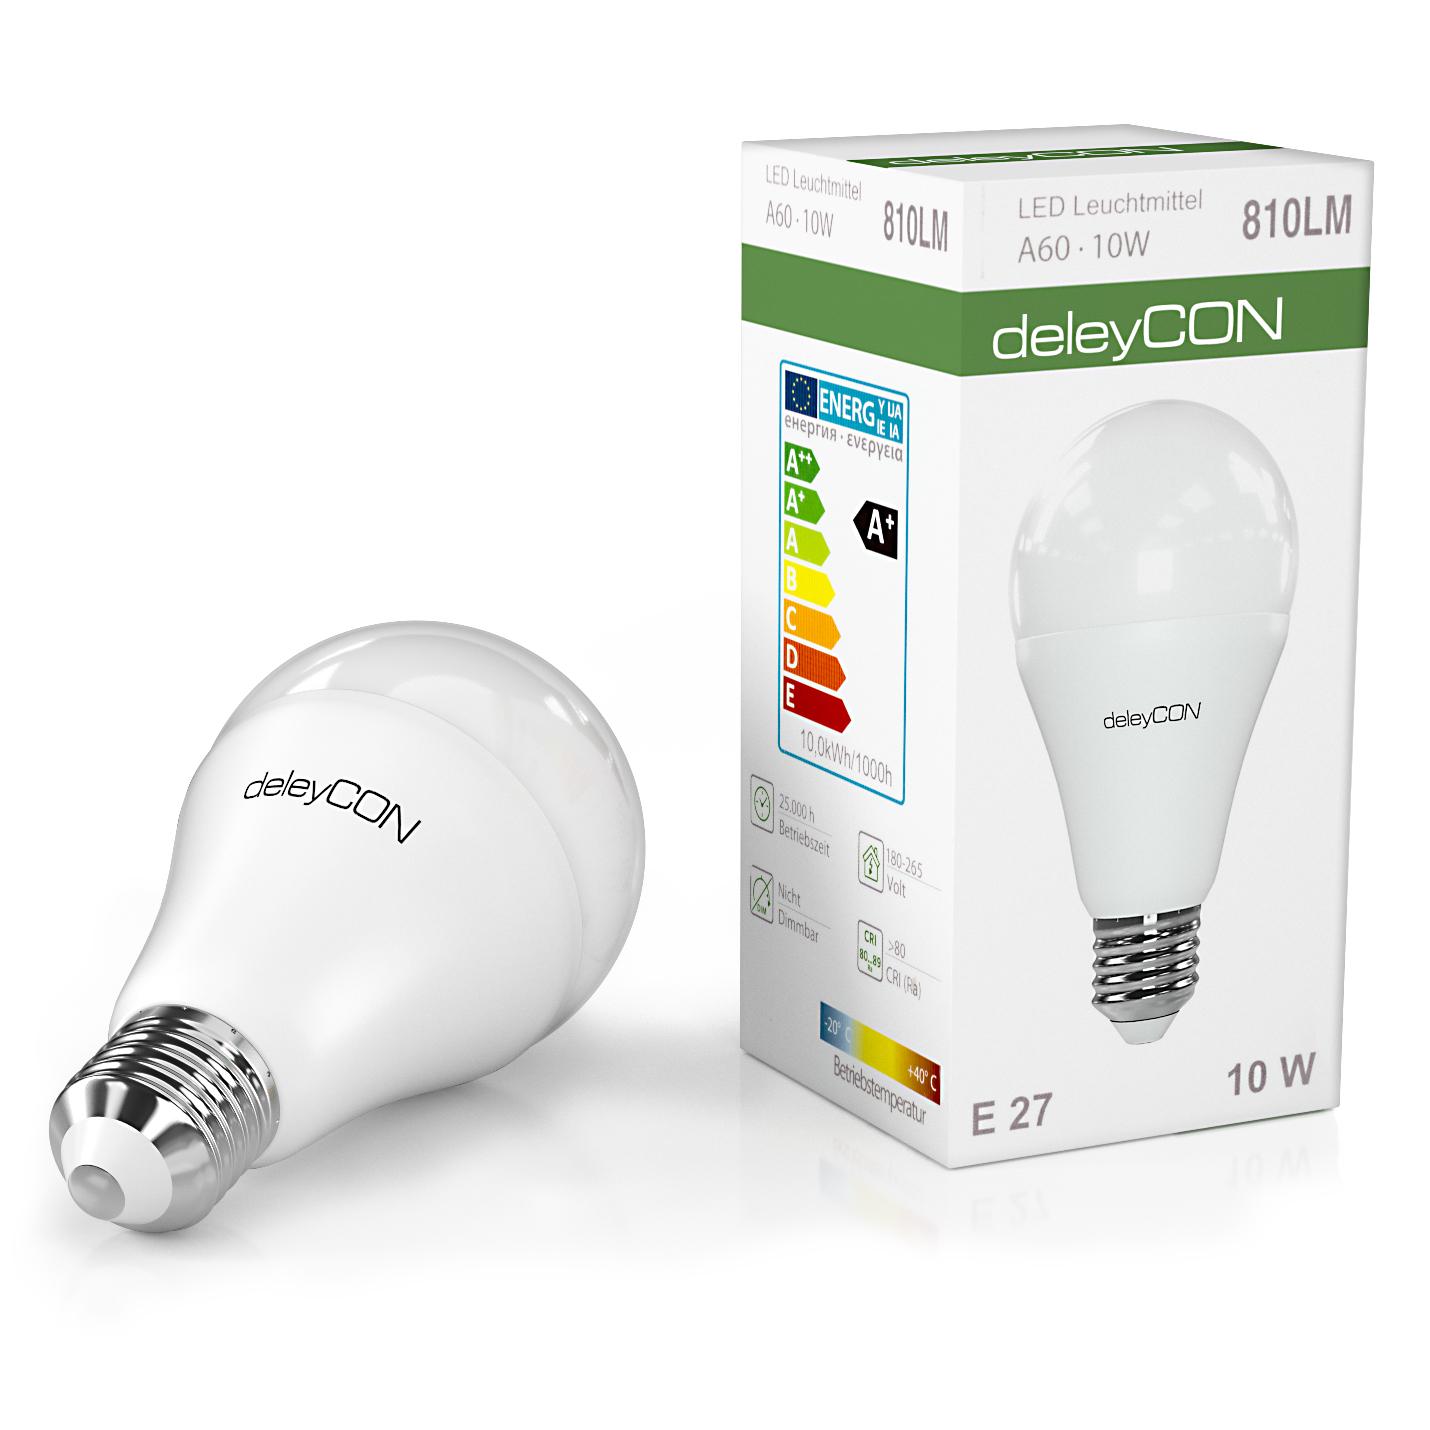 Deleycon led energiesparlampe e27 a60 6000k kalt wei deleycon led energiesparlampe e27 a60 6000k kalt wei leistung 10w parisarafo Gallery